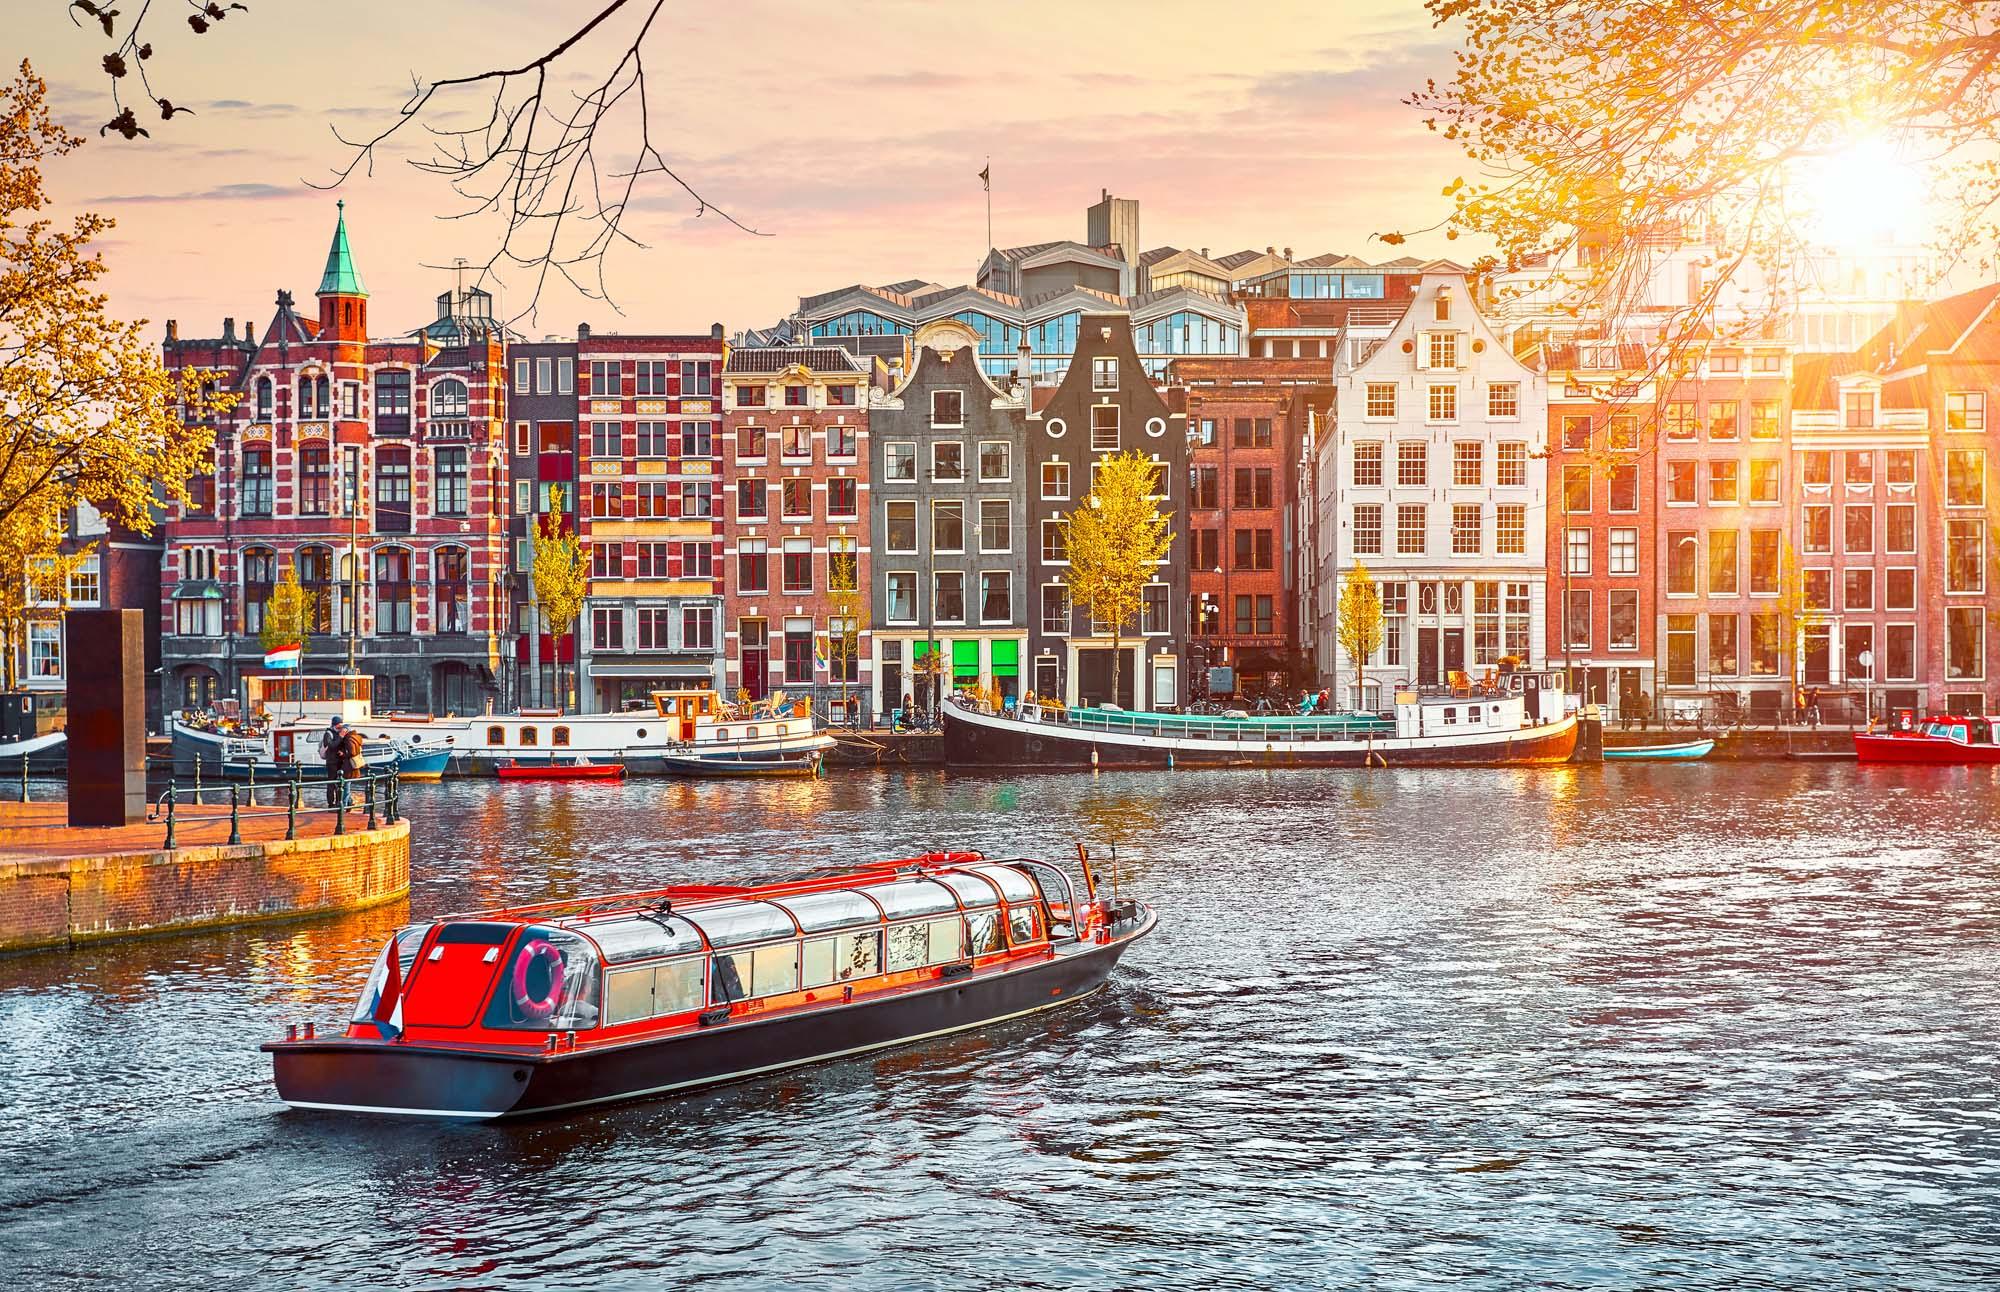 Amsterdam, Netherlands eid sumemr travel destination ideas